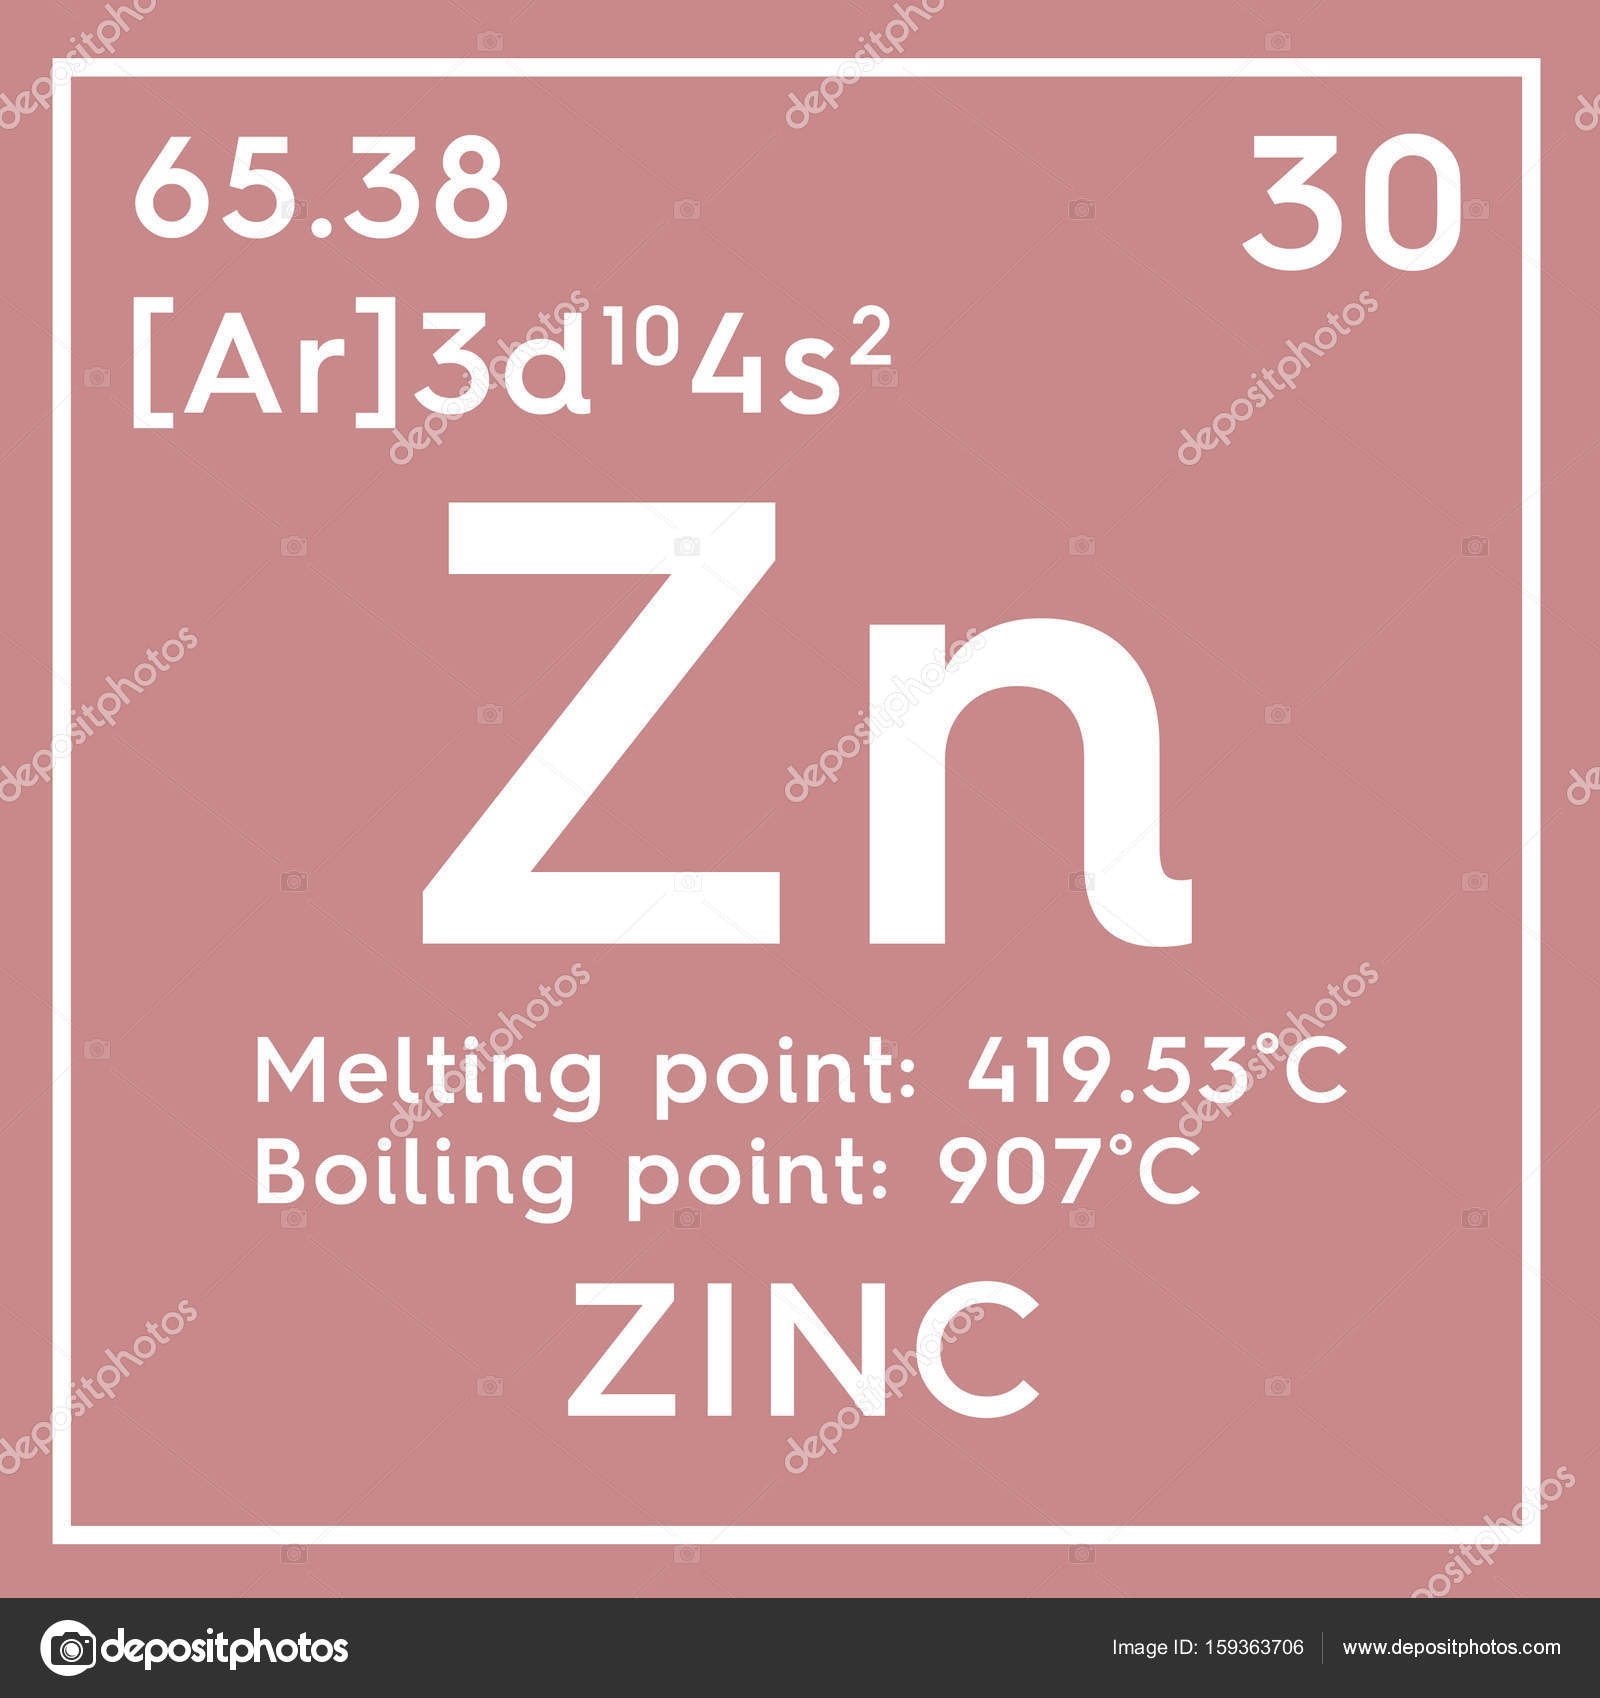 Zinc metales de transicin elemento qumico de la tabla de zinc metales de transicin elemento qumico de la tabla de periodica de mendeleiev urtaz Images